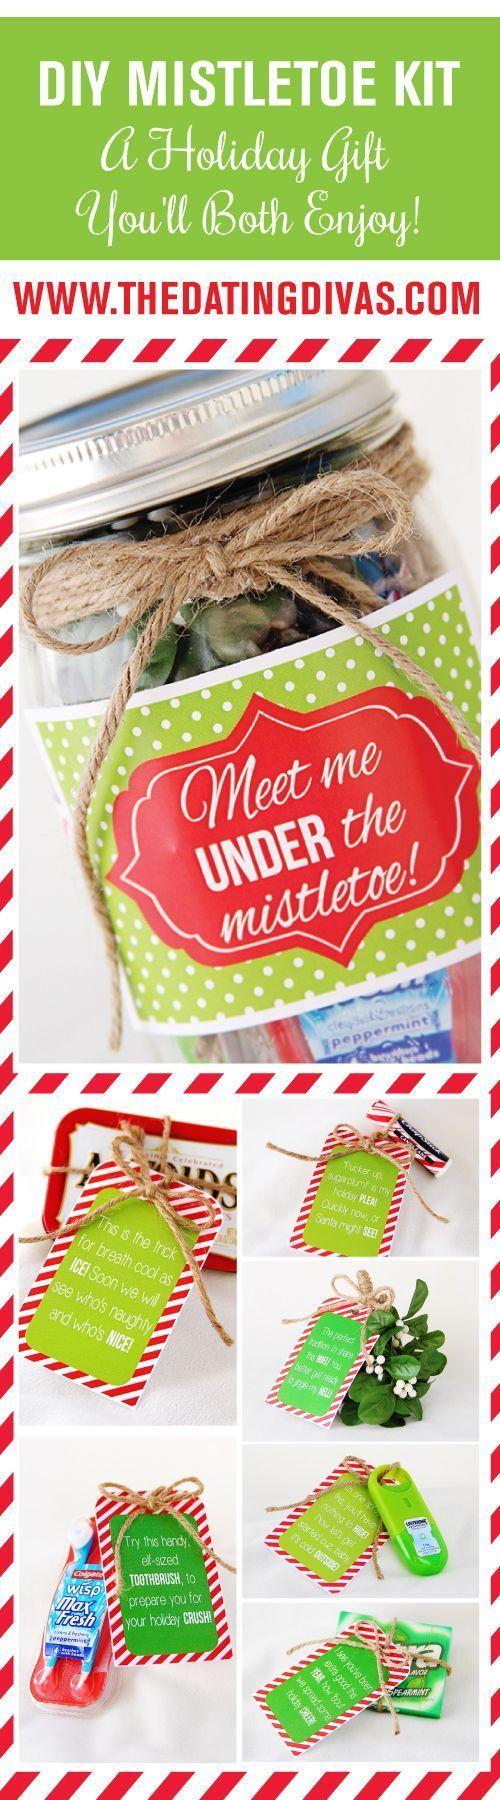 DIY Mistletoe Kit: A Holiday Gift You'll Both Enjoy!